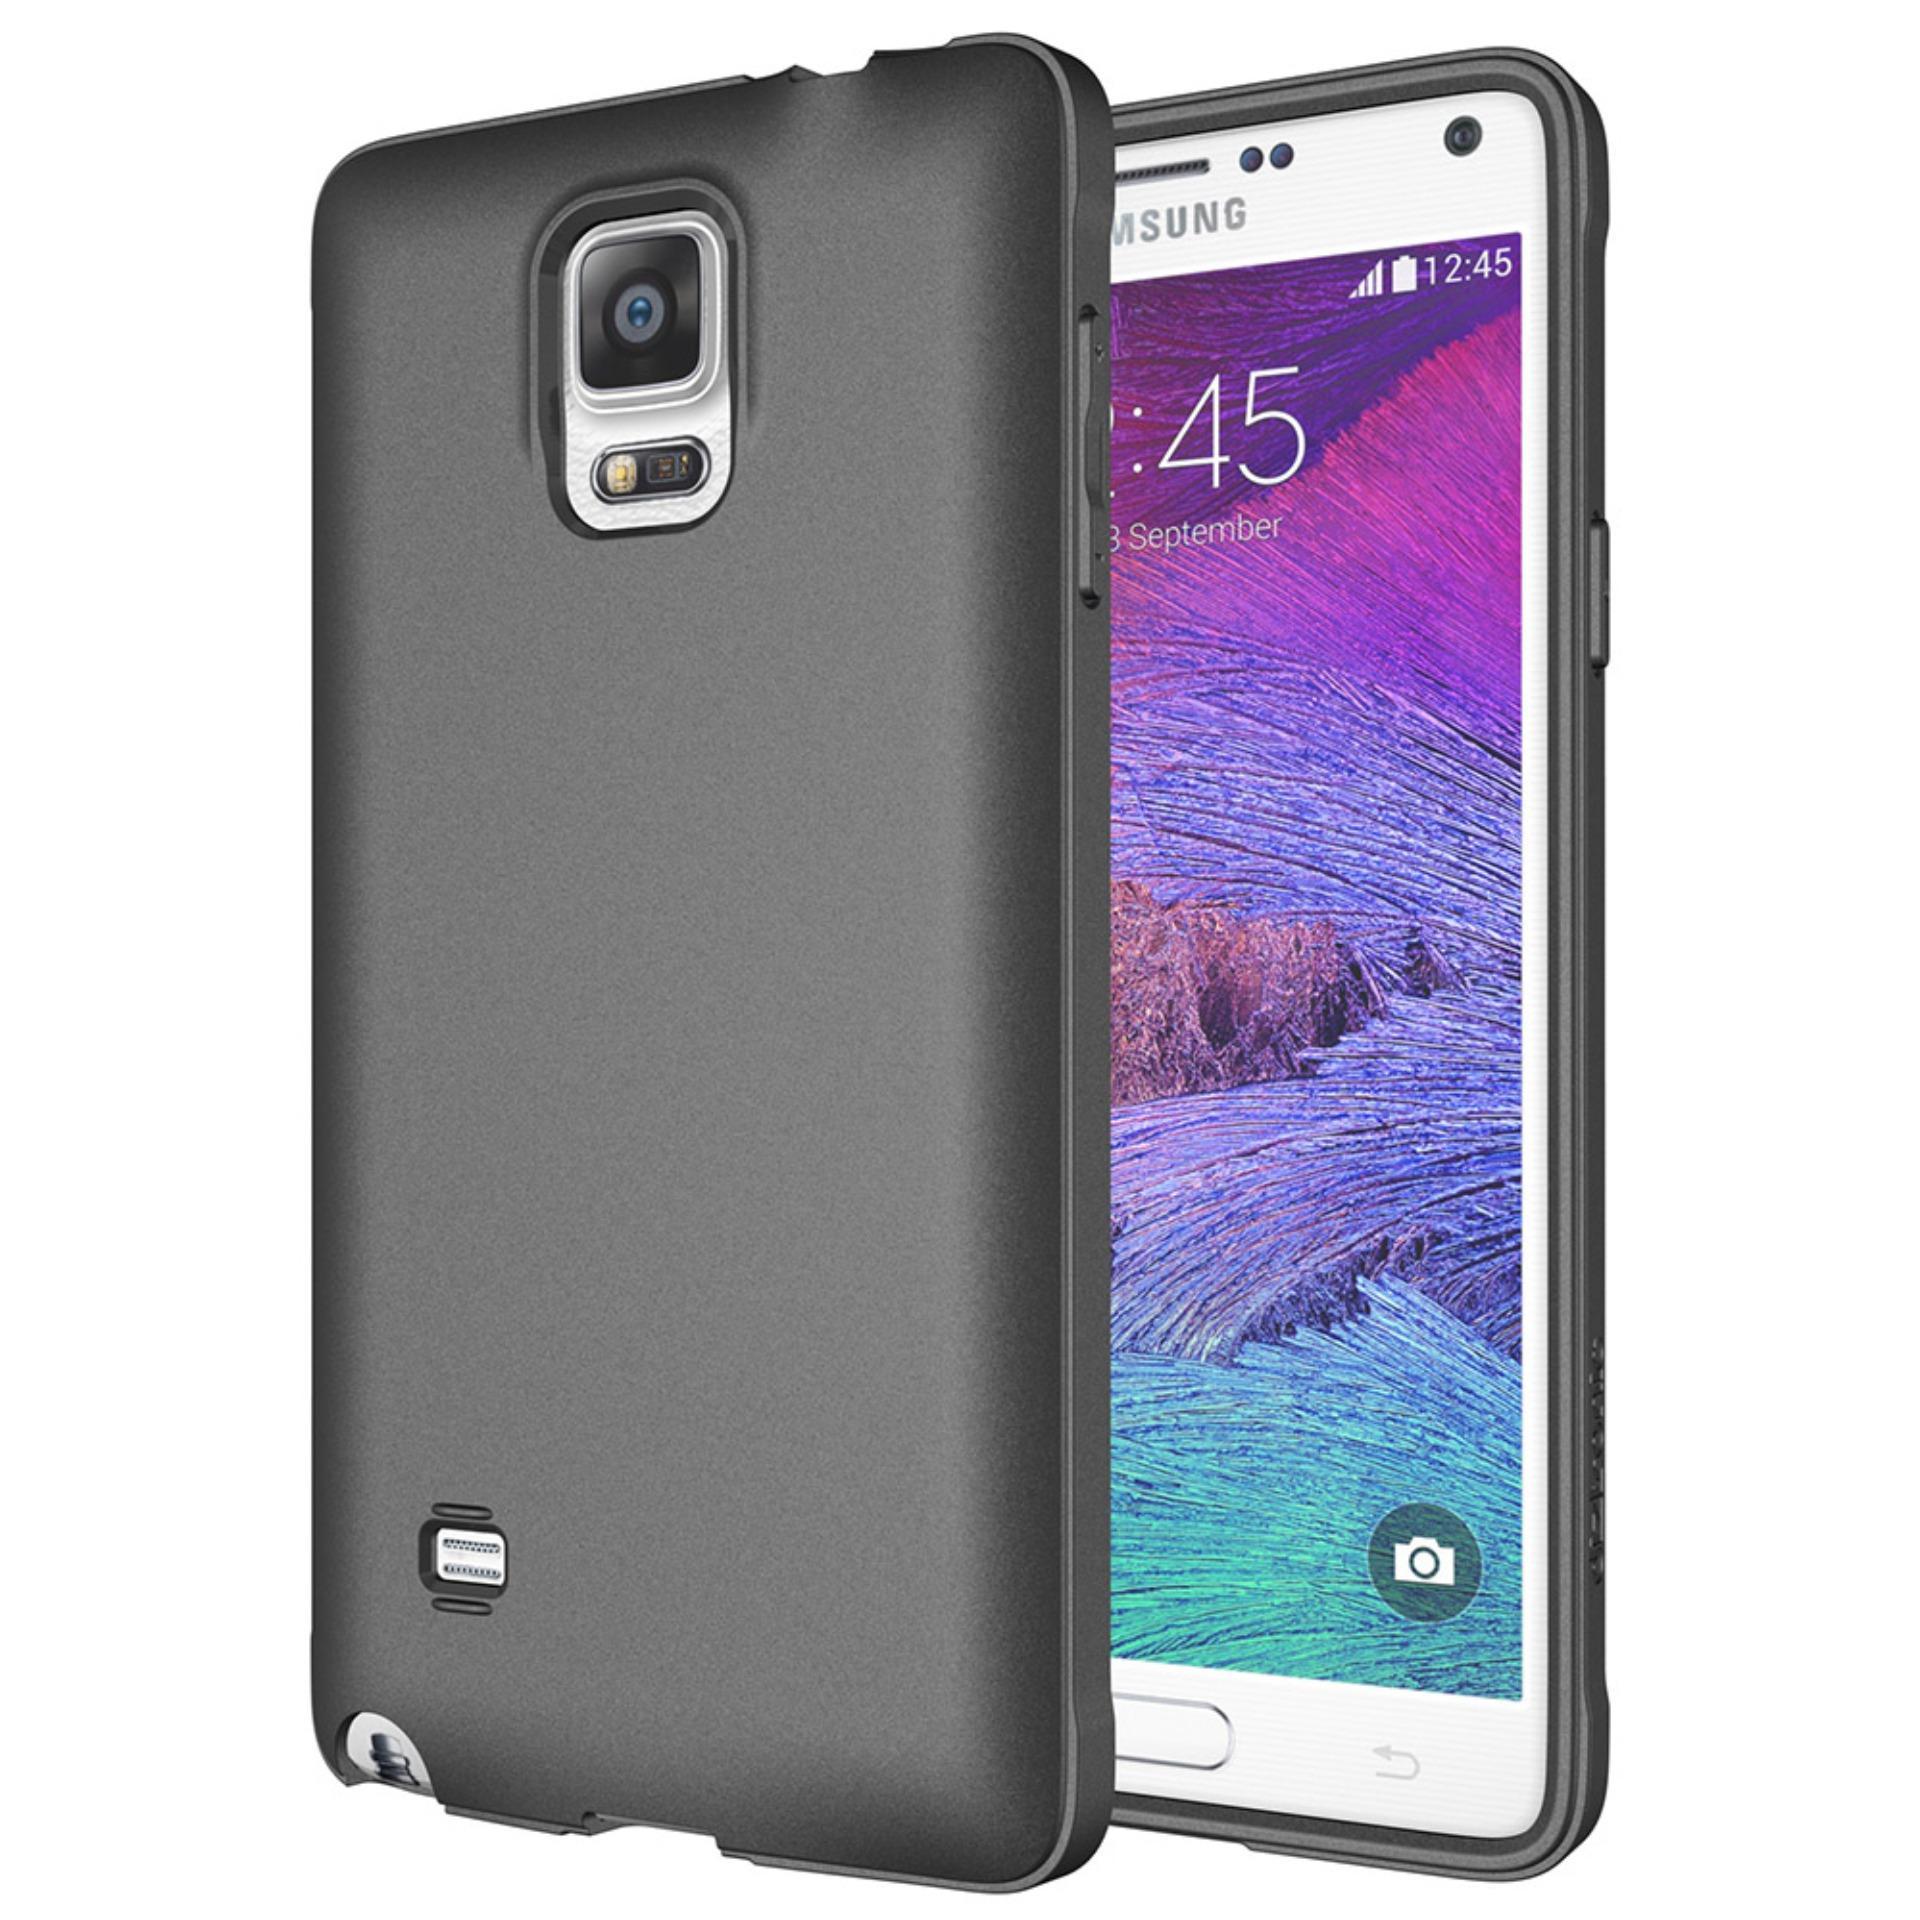 Rp24.900DarkNight for Samsung Galaxy Note 4 / N910 / LTE / Duos | Slim Case Black Matte Softcase Premium (Anti Minyak/Anti Sidik Jari) - Hitam Doff